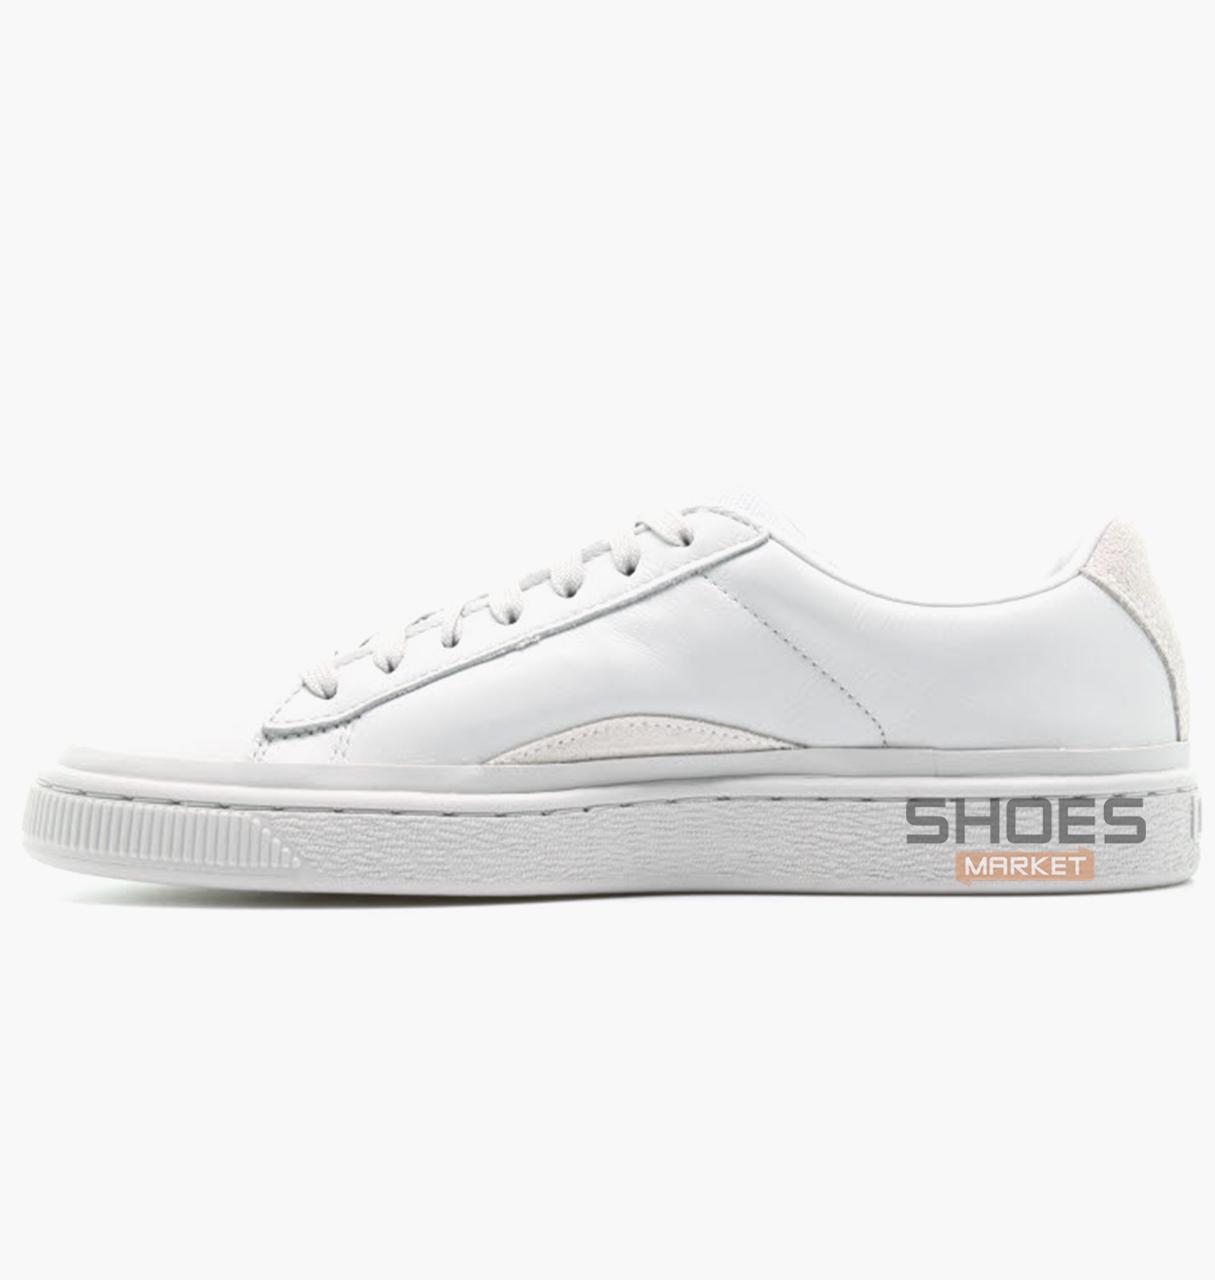 cheap for discount 219e3 c961f Мужские кроссовки Puma X HAN BASKET white 367185-02, оригинал купить в  интернет-магазине обуви Shoes Market - цена, отзывы, фото. Киев, Украина.